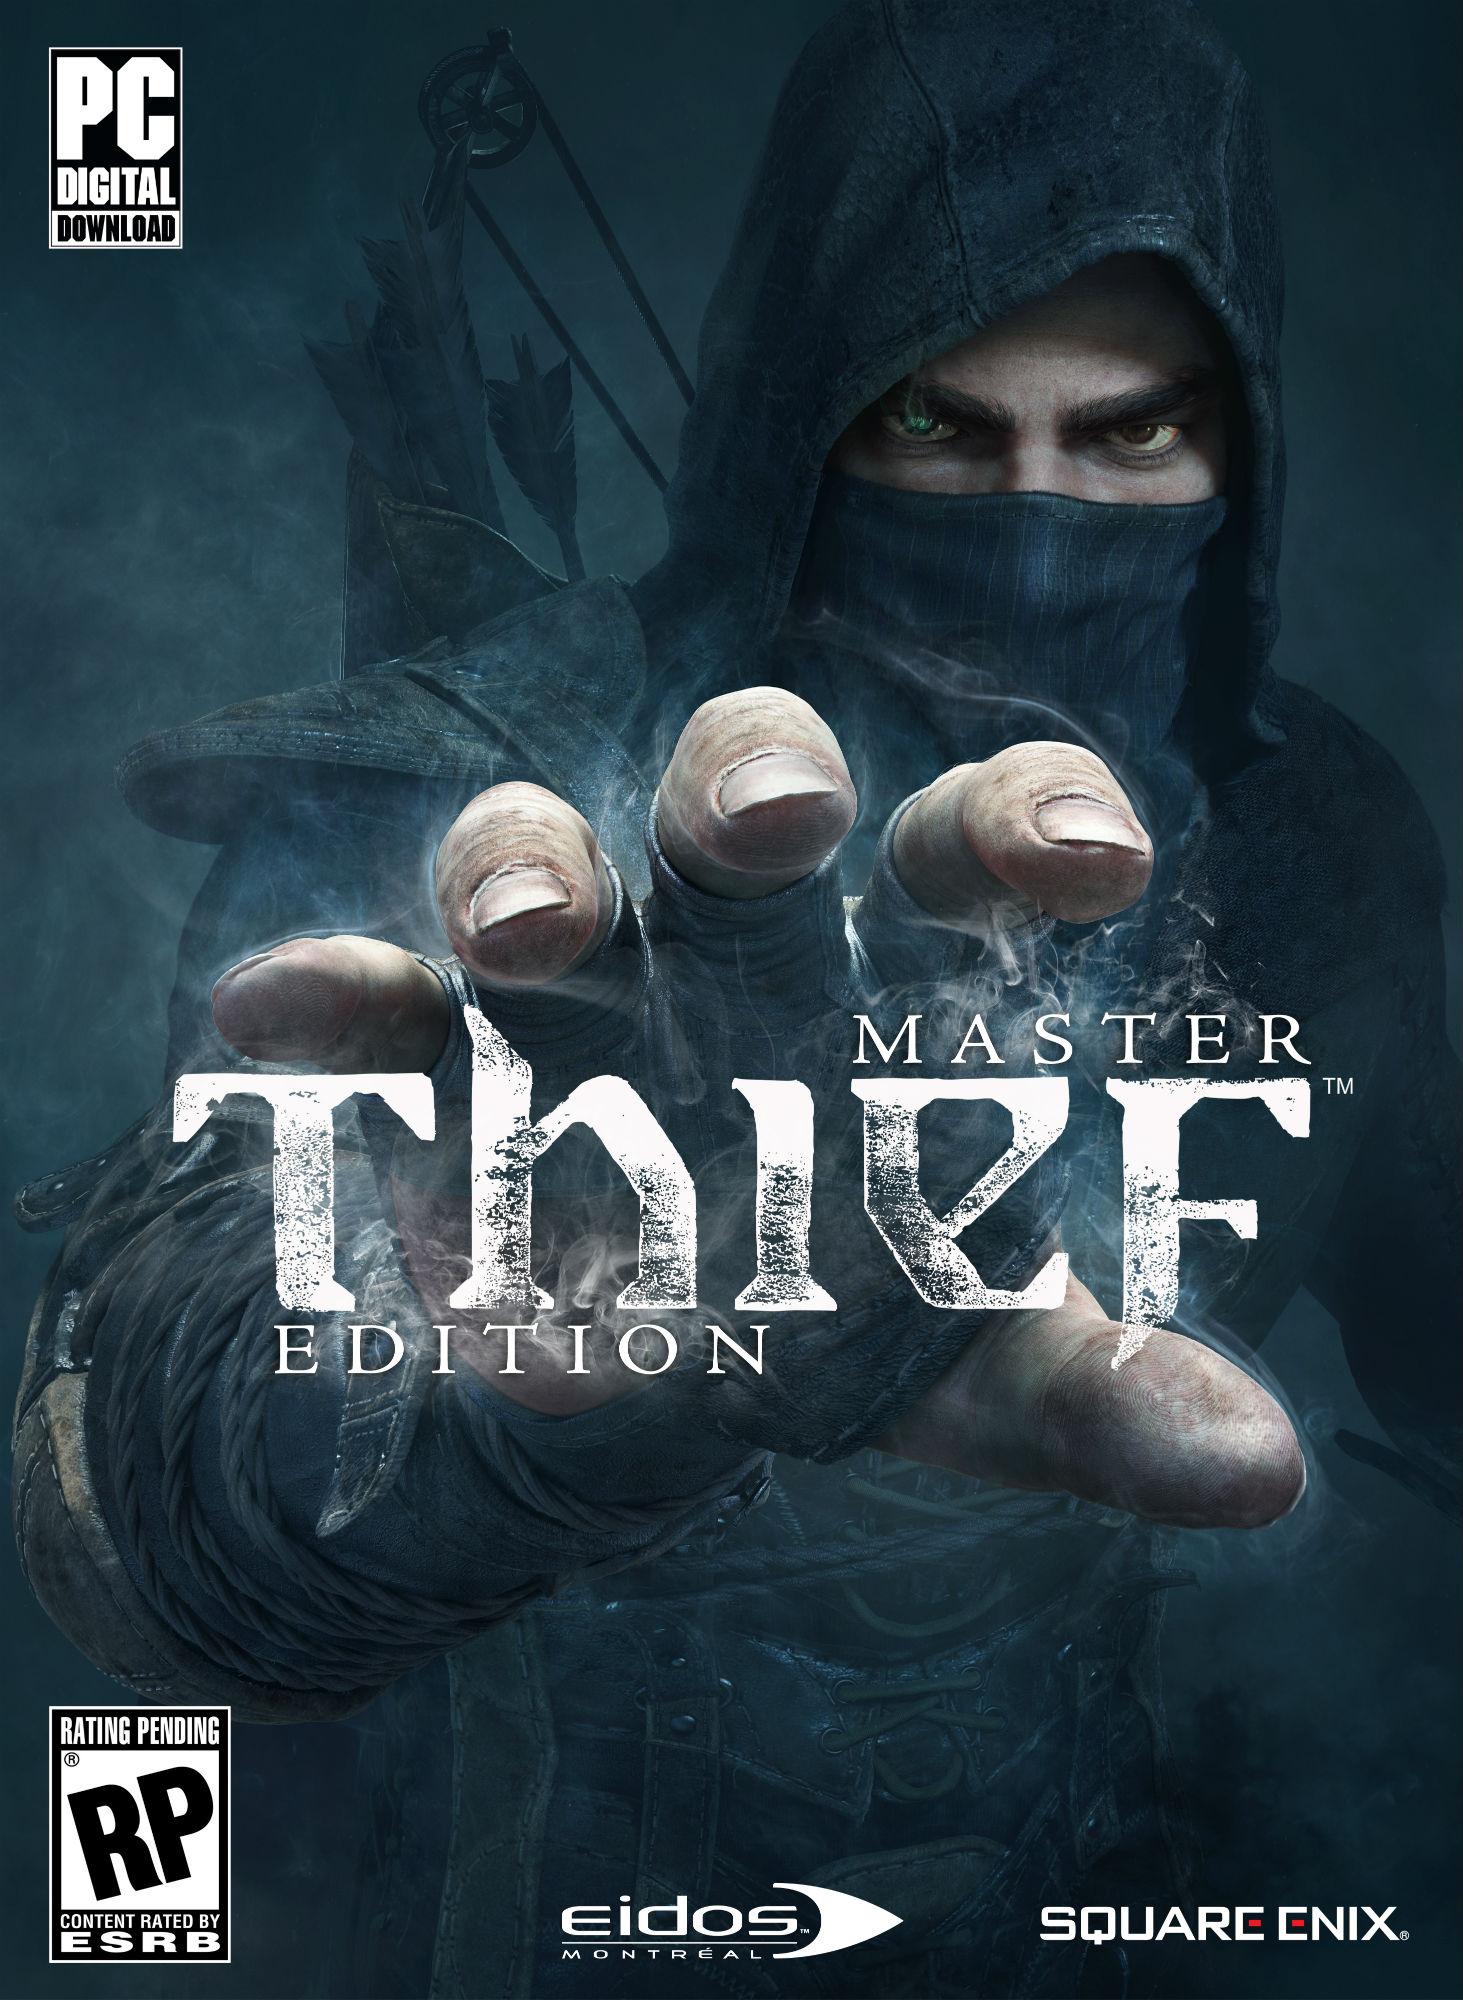 Thief: Master Thief Edition (2014) RePack